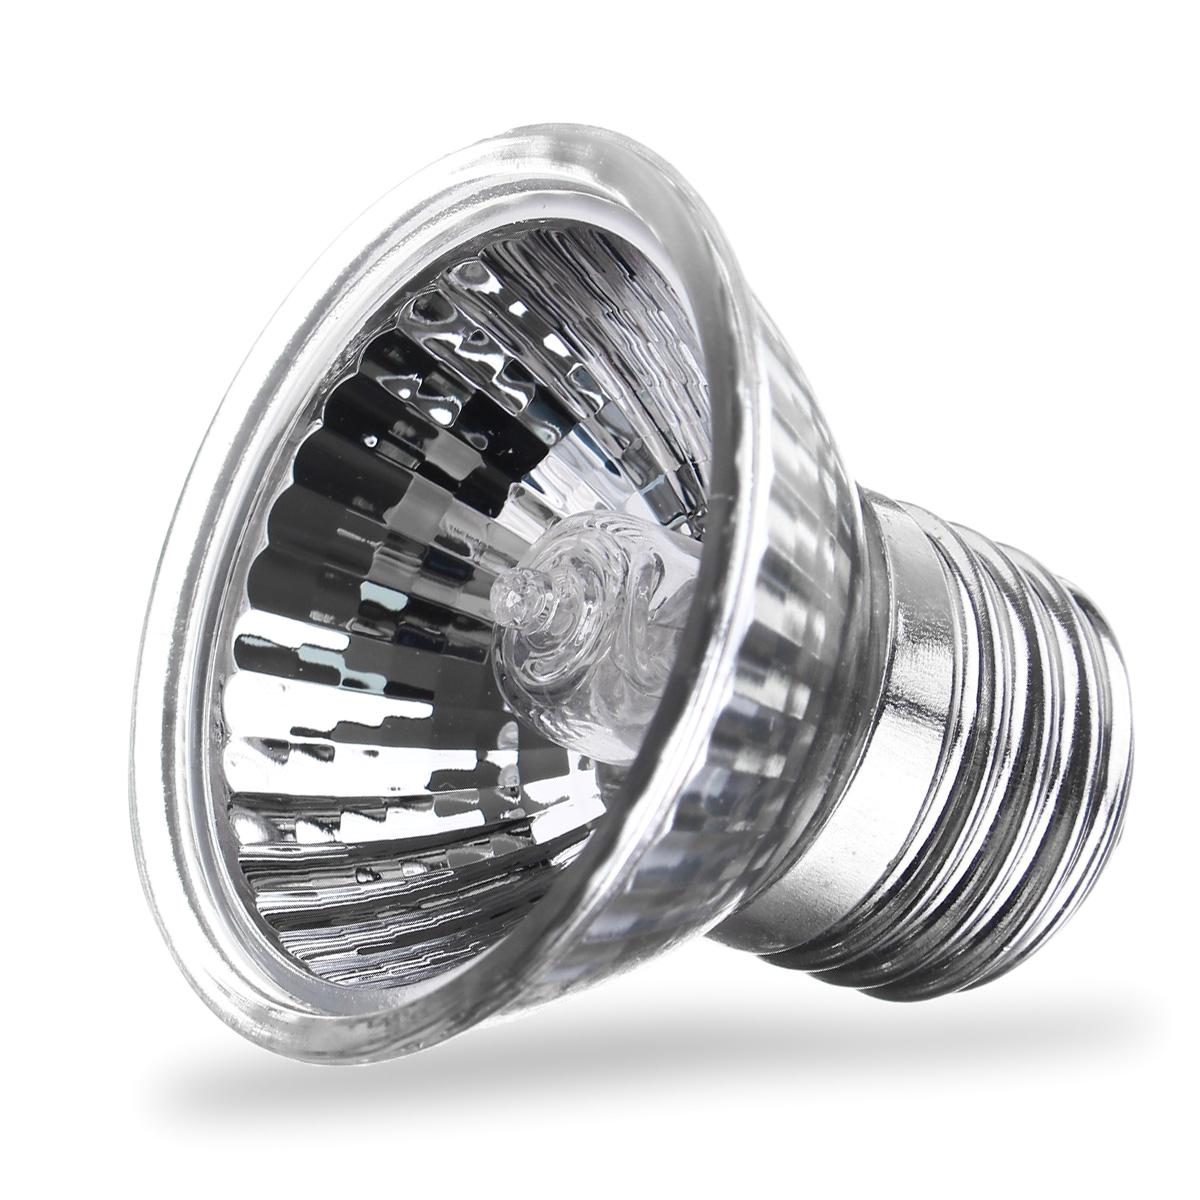 e27 25w 40w 50w 60w 75w uvauvb led light bulb reptile pet terrarium brooder